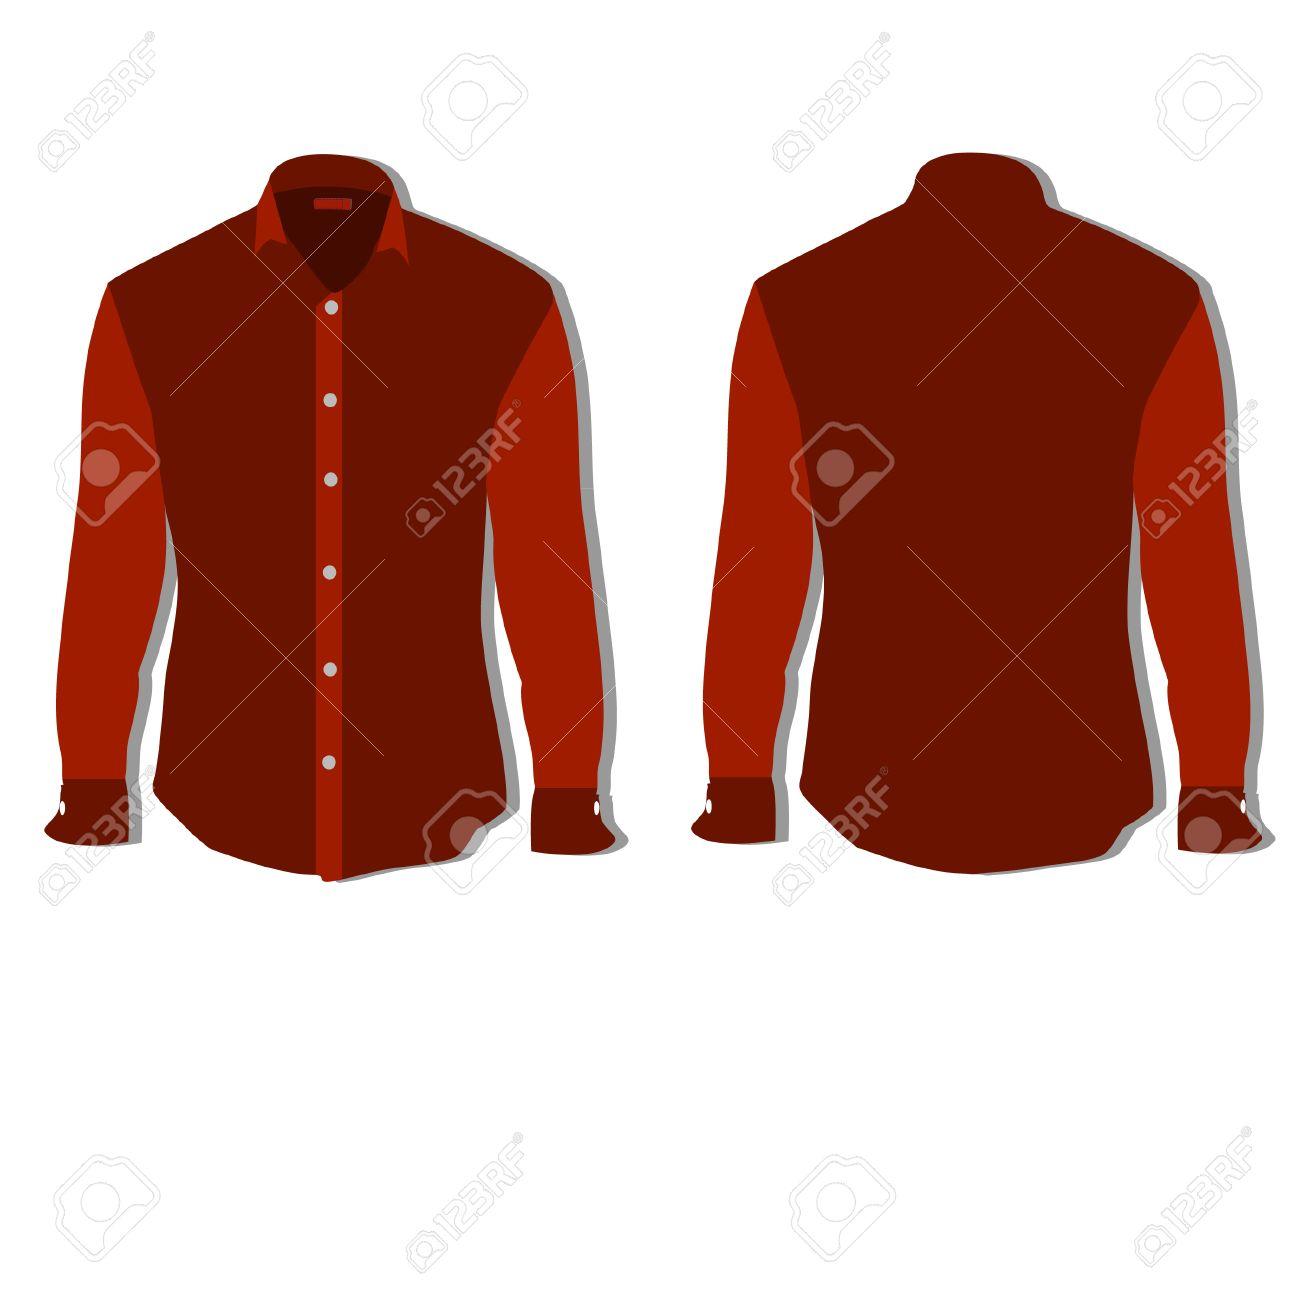 Illustration Of Tshirt Clothes Man Shirt Formal Shirt Royalty - Red t shirt template